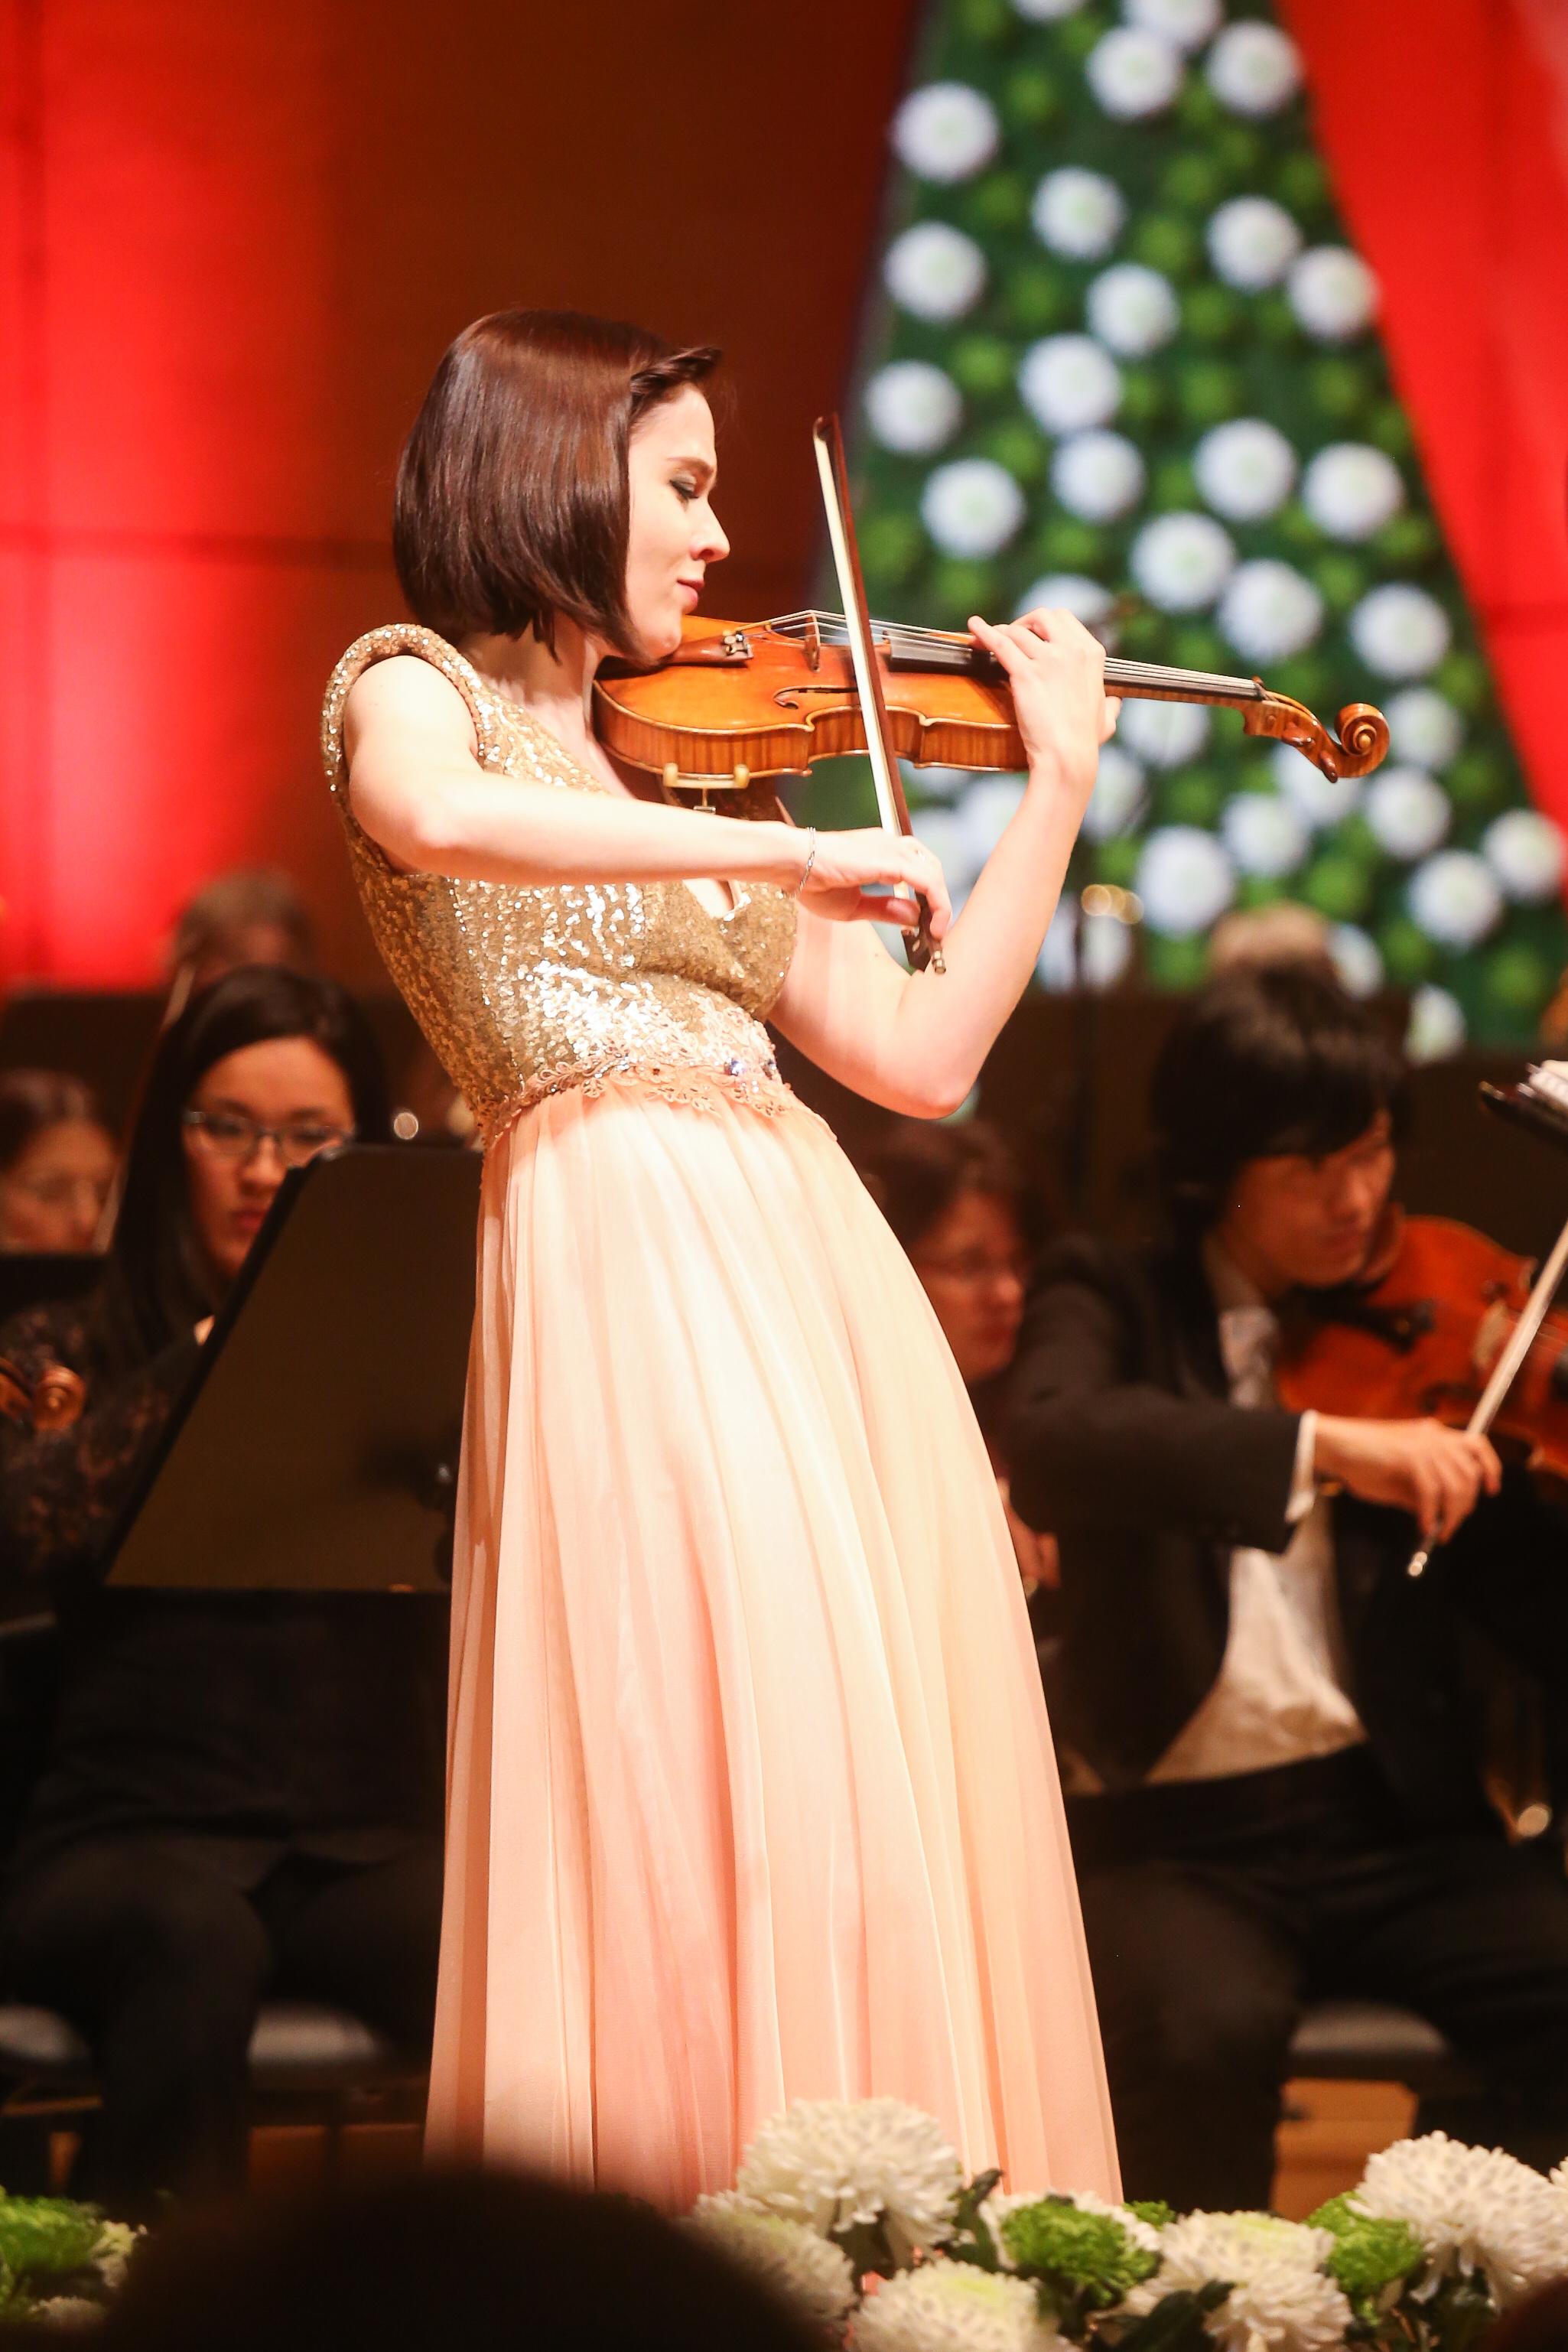 managers concert, Ana Julija Mlejnik